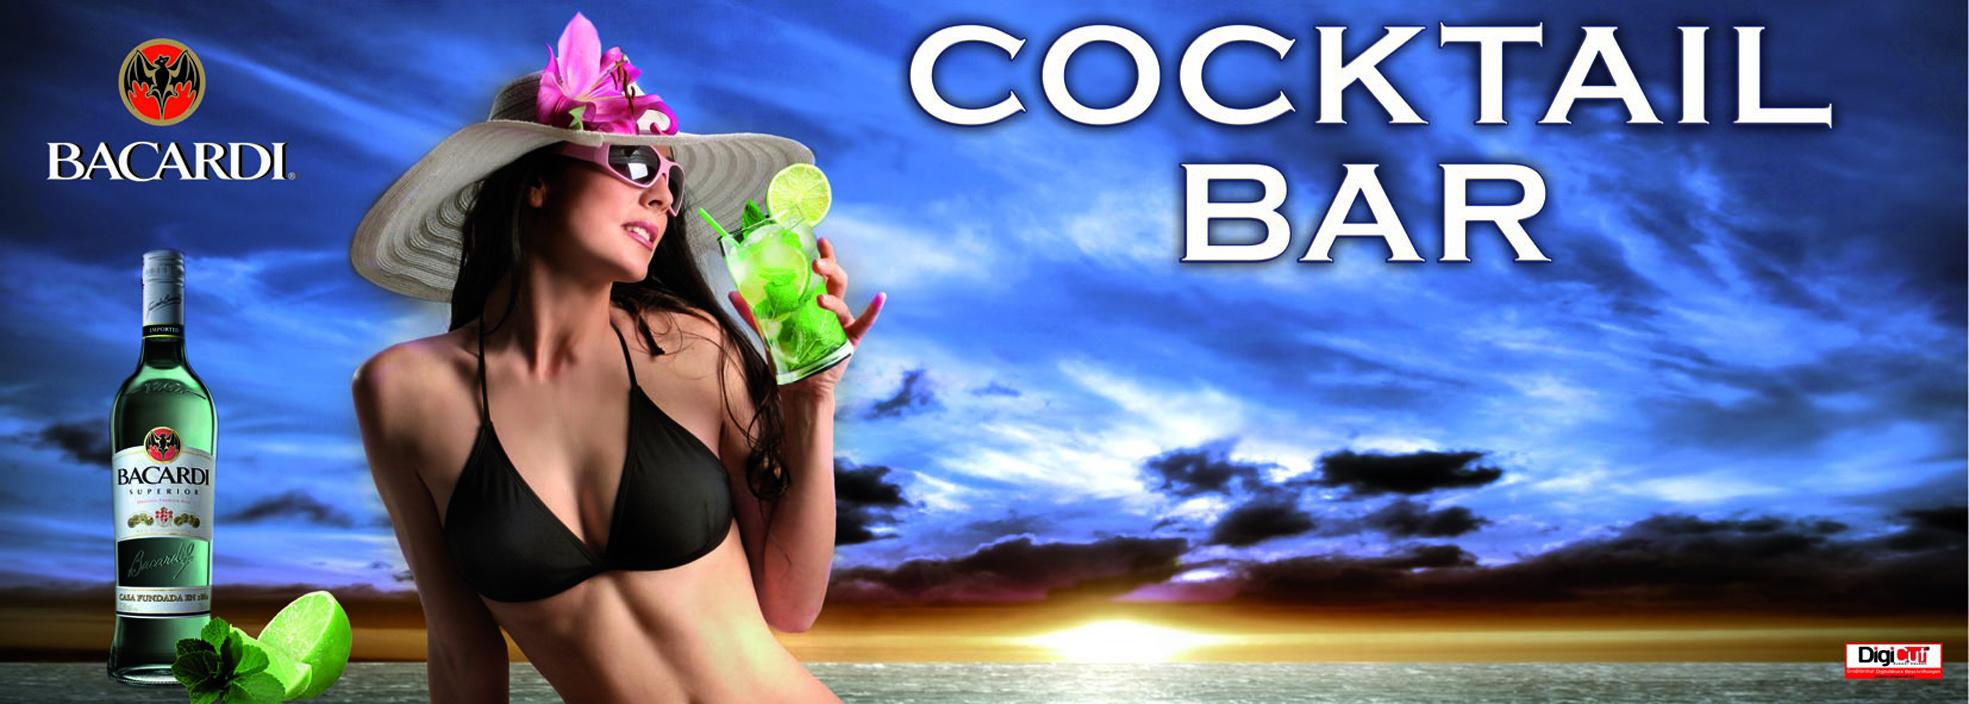 Stoff -Cocktail 250x700 cm